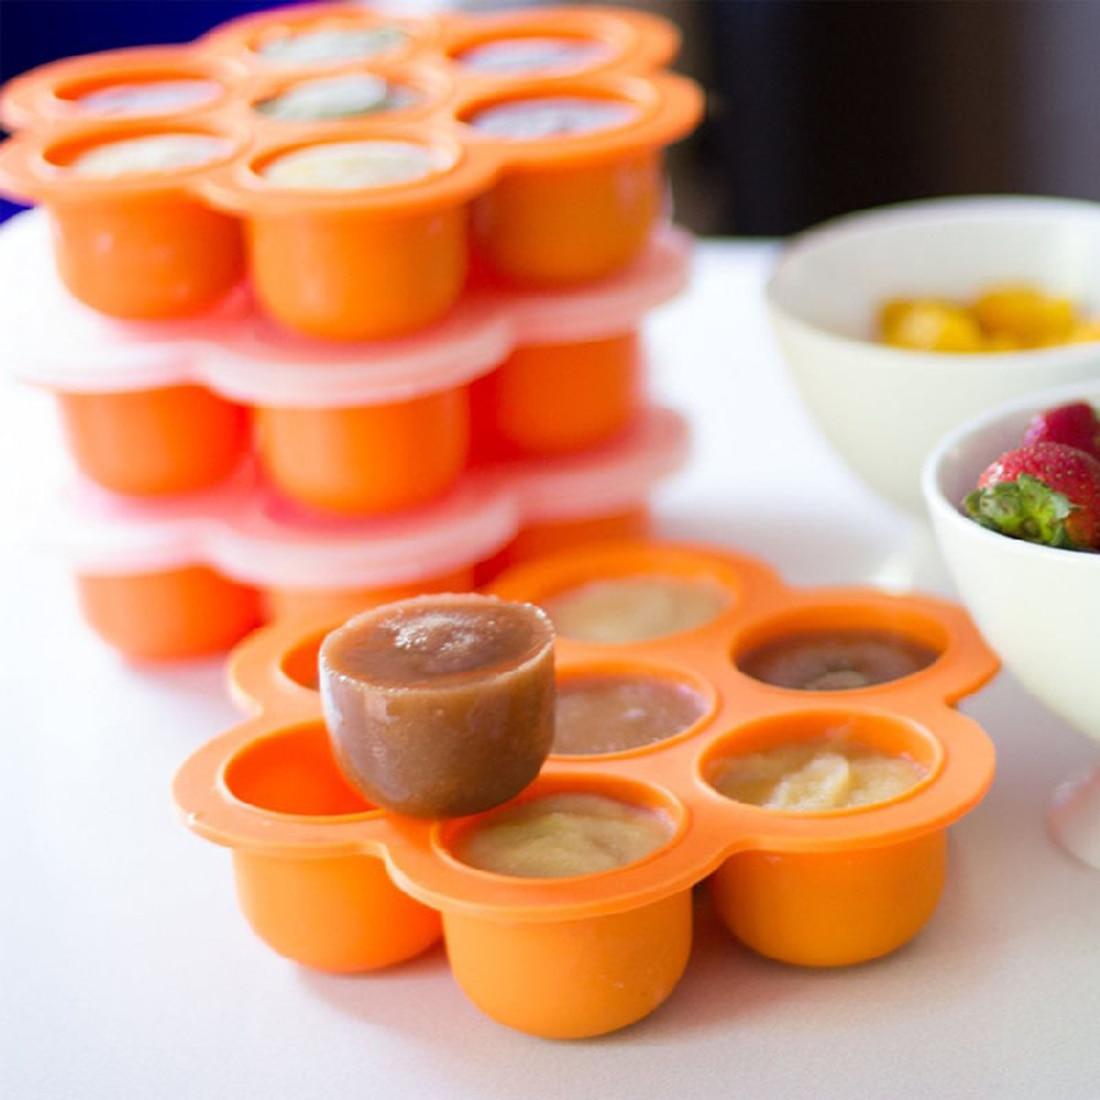 1pcs Baby Food Freezer Tray Storage Box With Silicone Clip